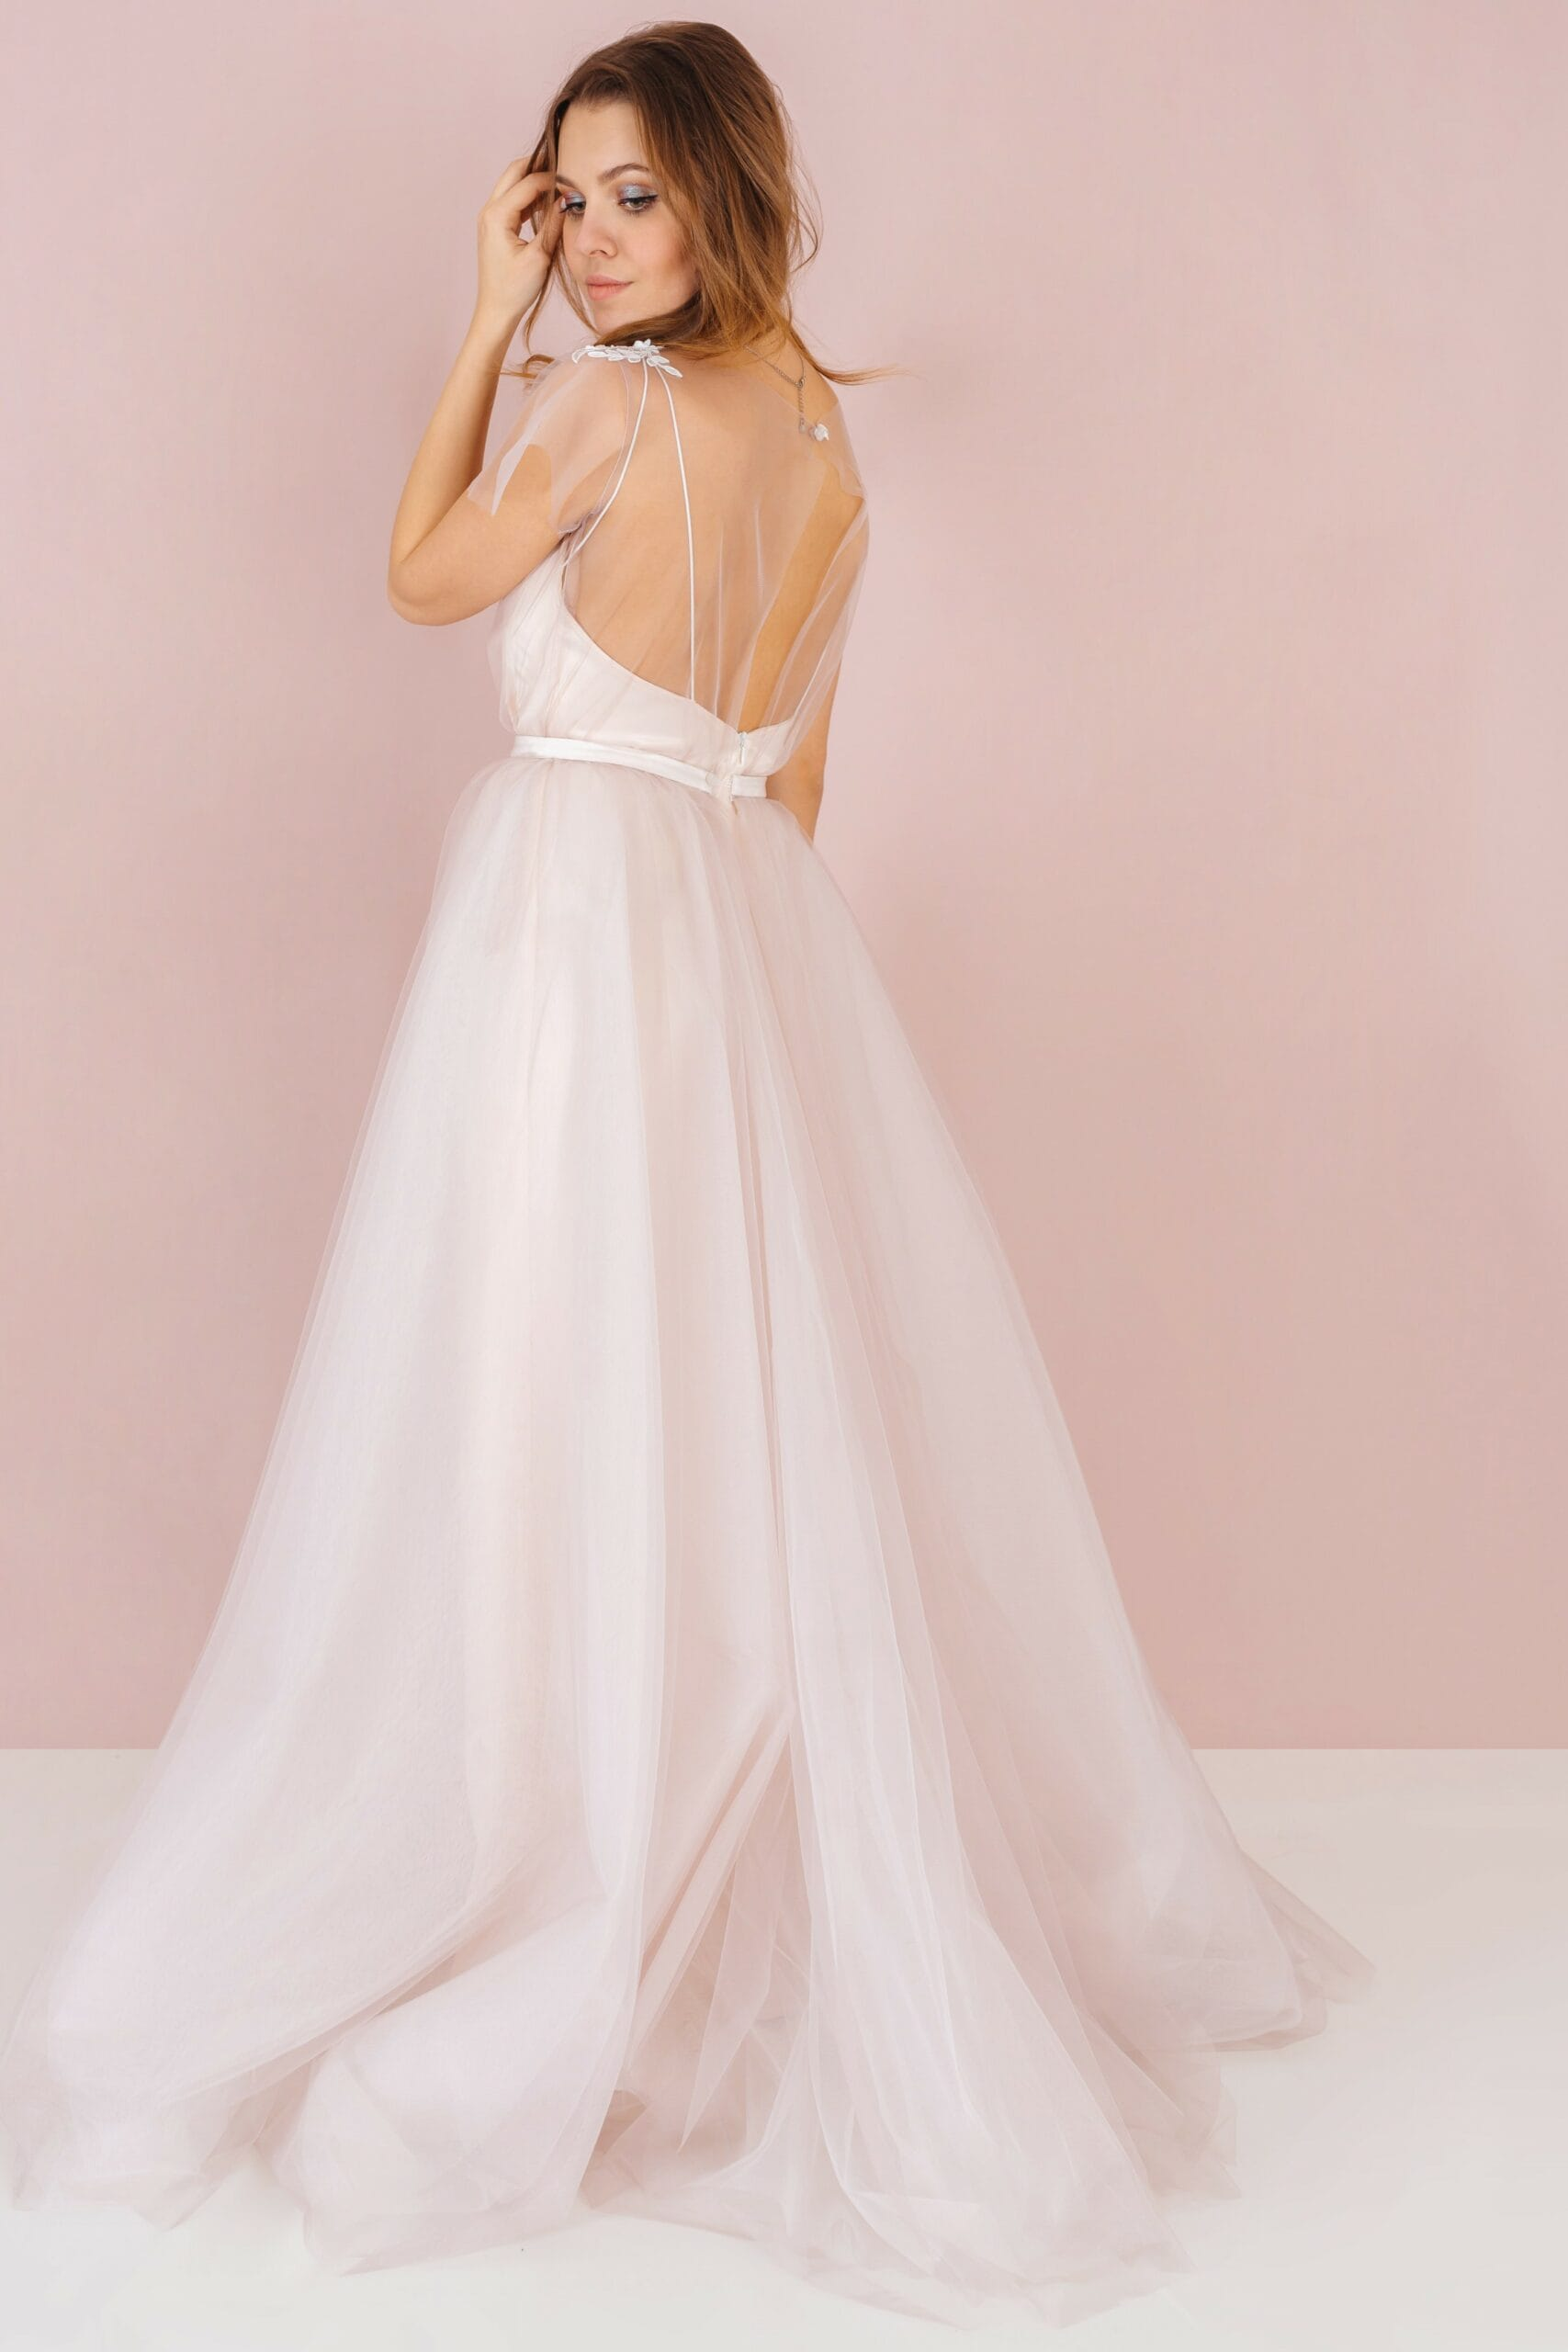 Свадебное платье LOTTI, коллекция LOFT, бренд RARE BRIDAL, фото 2